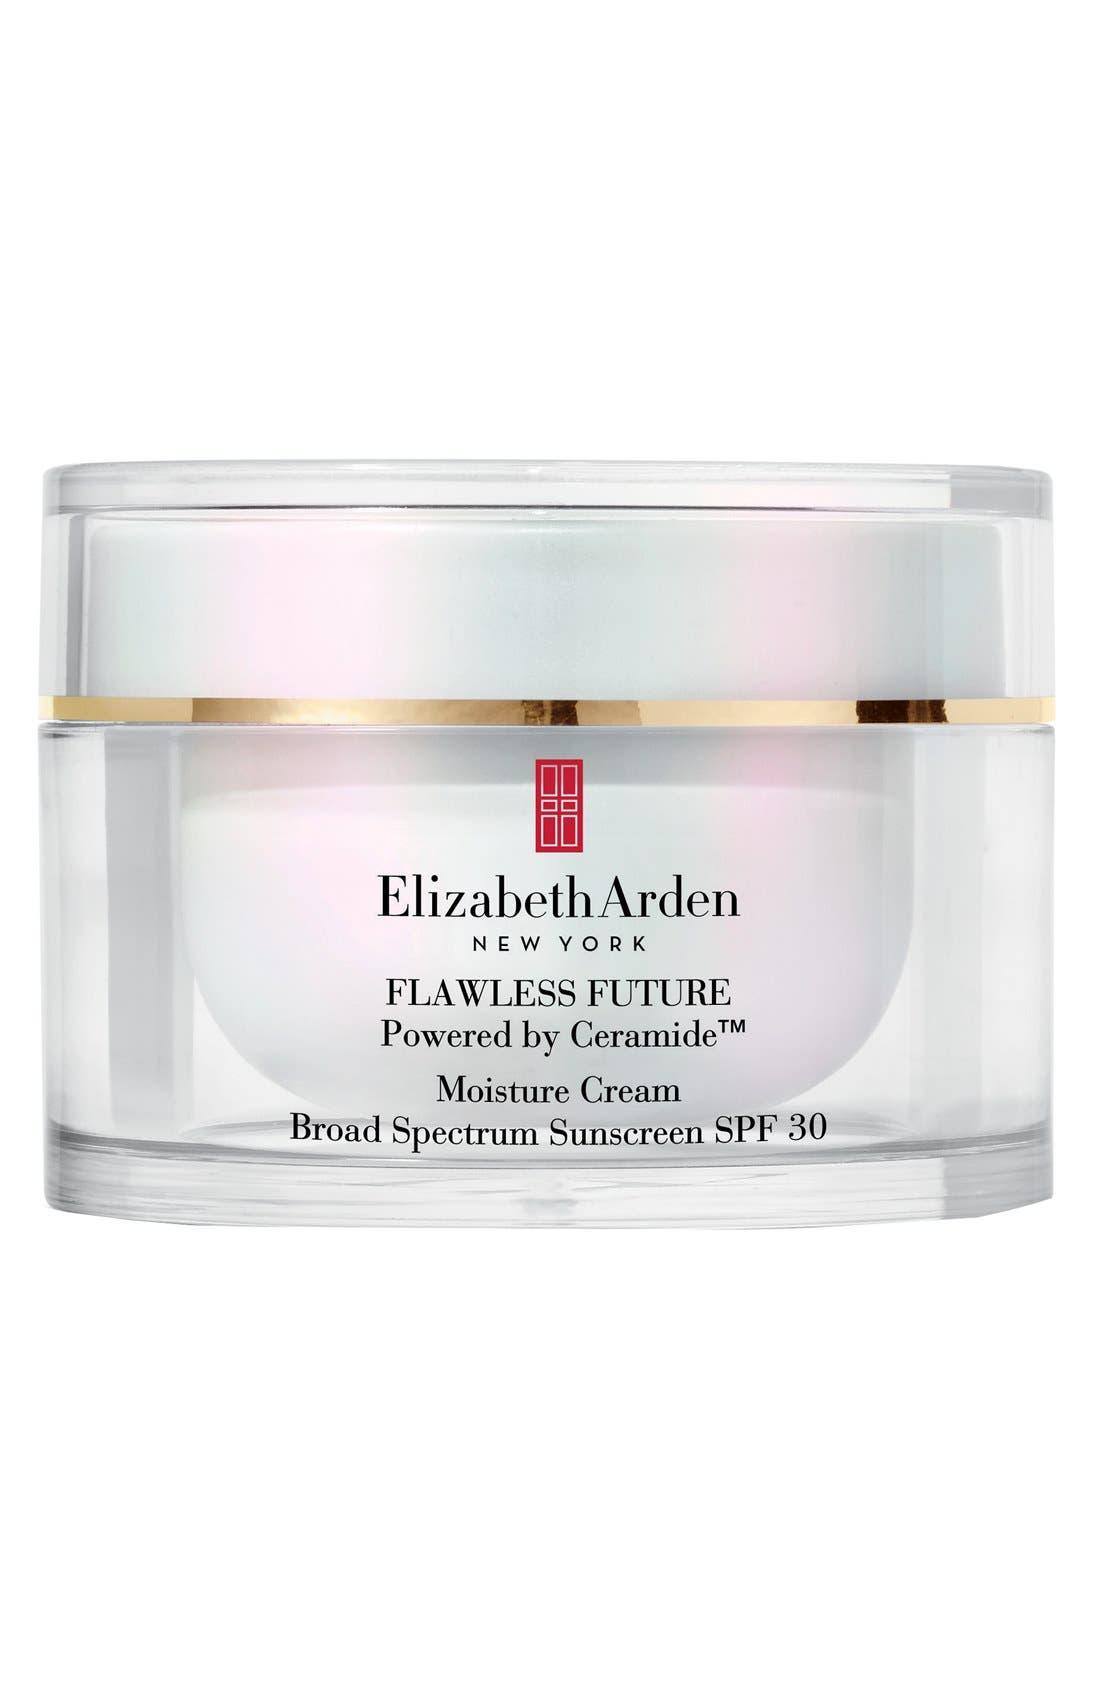 Elizabeth Arden Flawless Future Powered By Ceramide(TM) Moisture Cream Broad Spectrum Sunscreen Spf 30